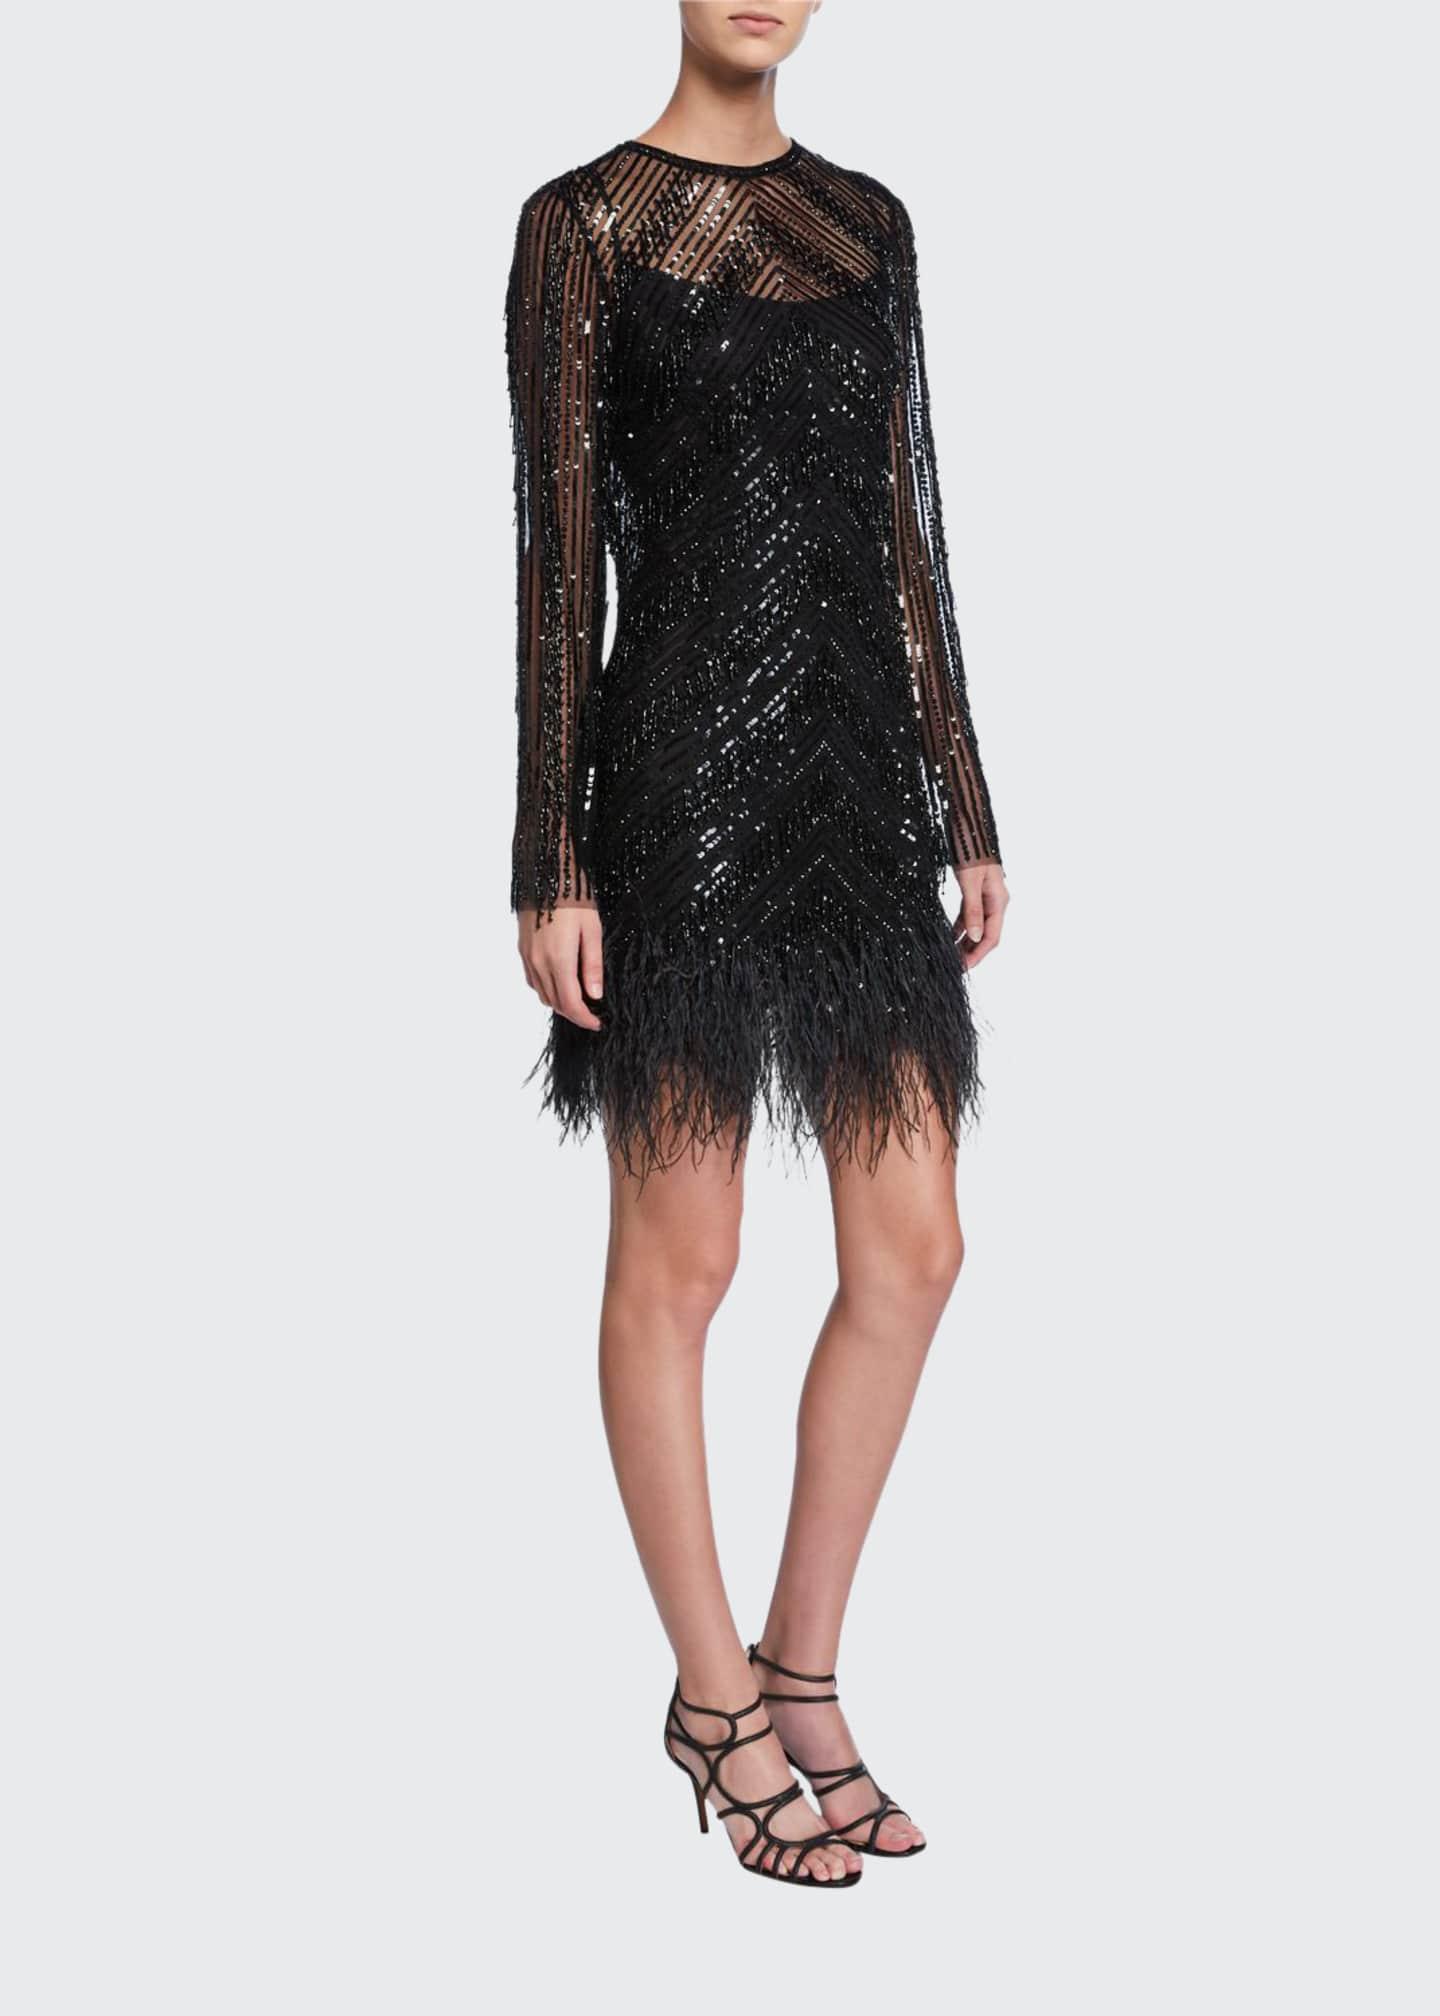 Rachel Gilbert Embellished Long-Sleeve Cocktail Dress